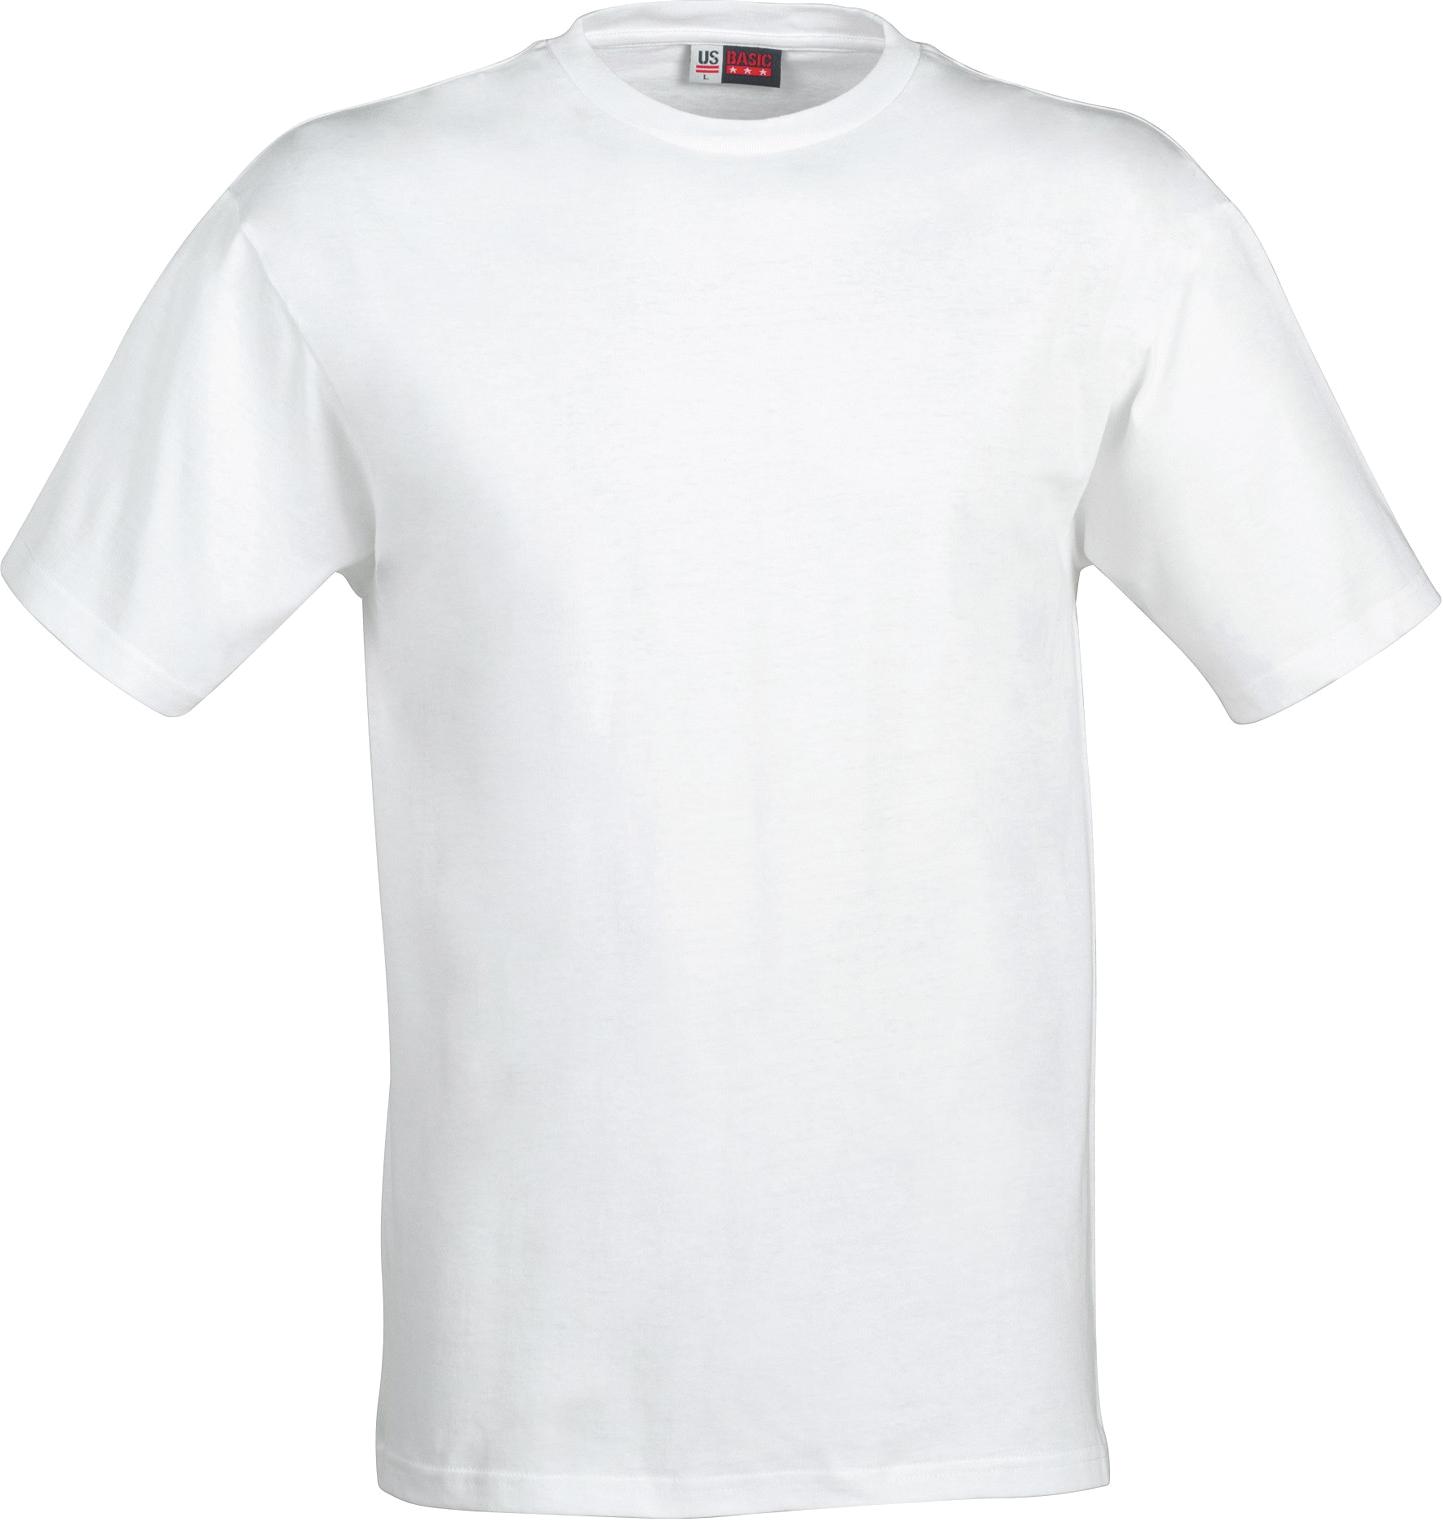 White T Shirt Png Image Camisas Estilosas Camiseta Branca Camisetas Brancas